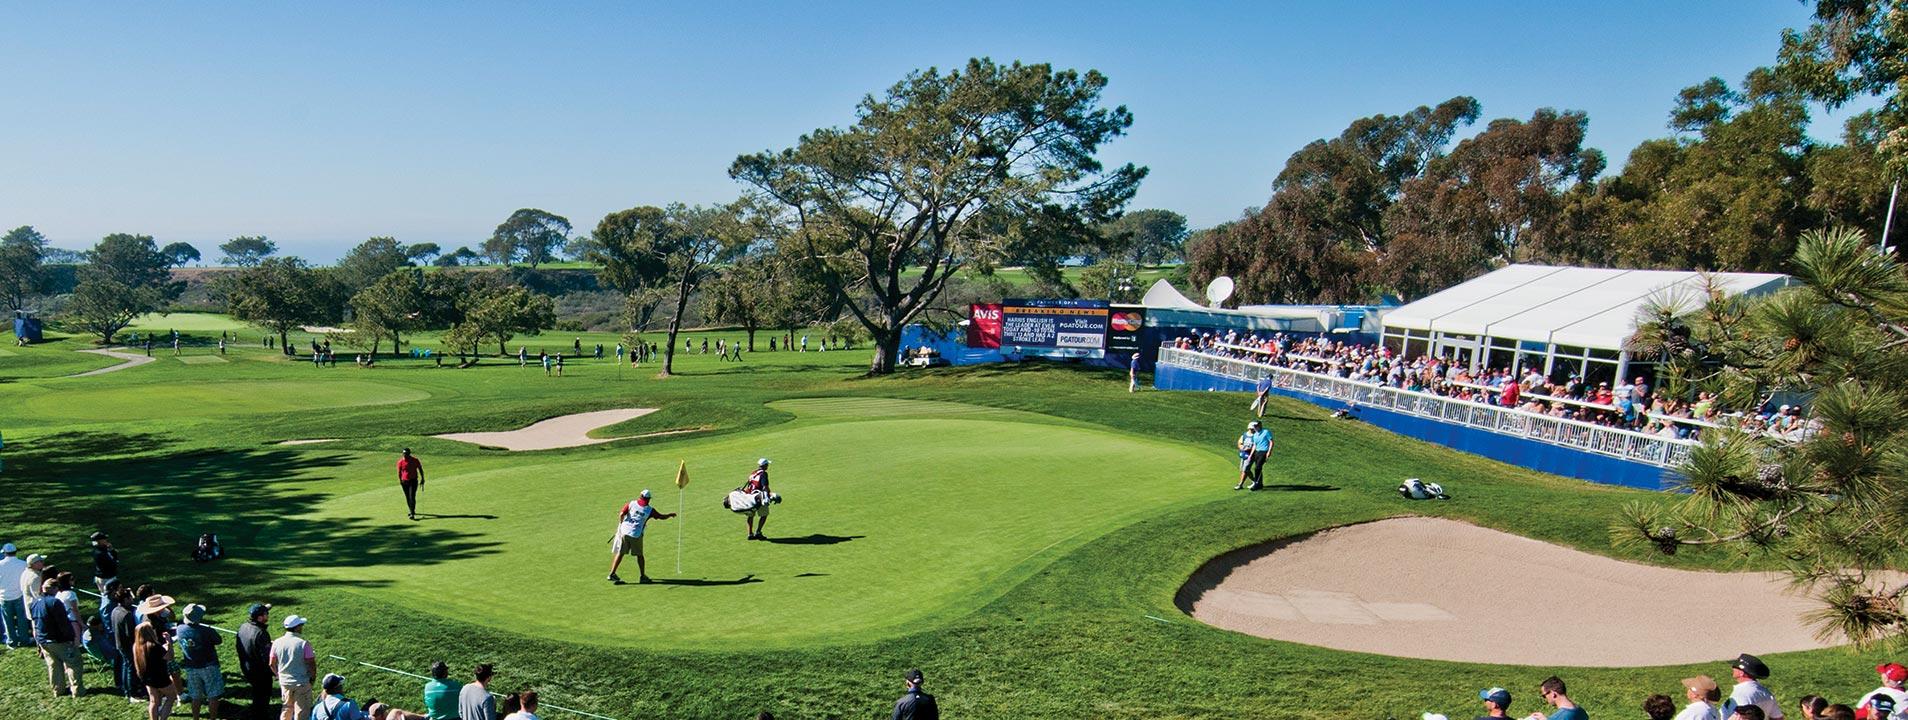 2017 farmers insurance open – golf content network